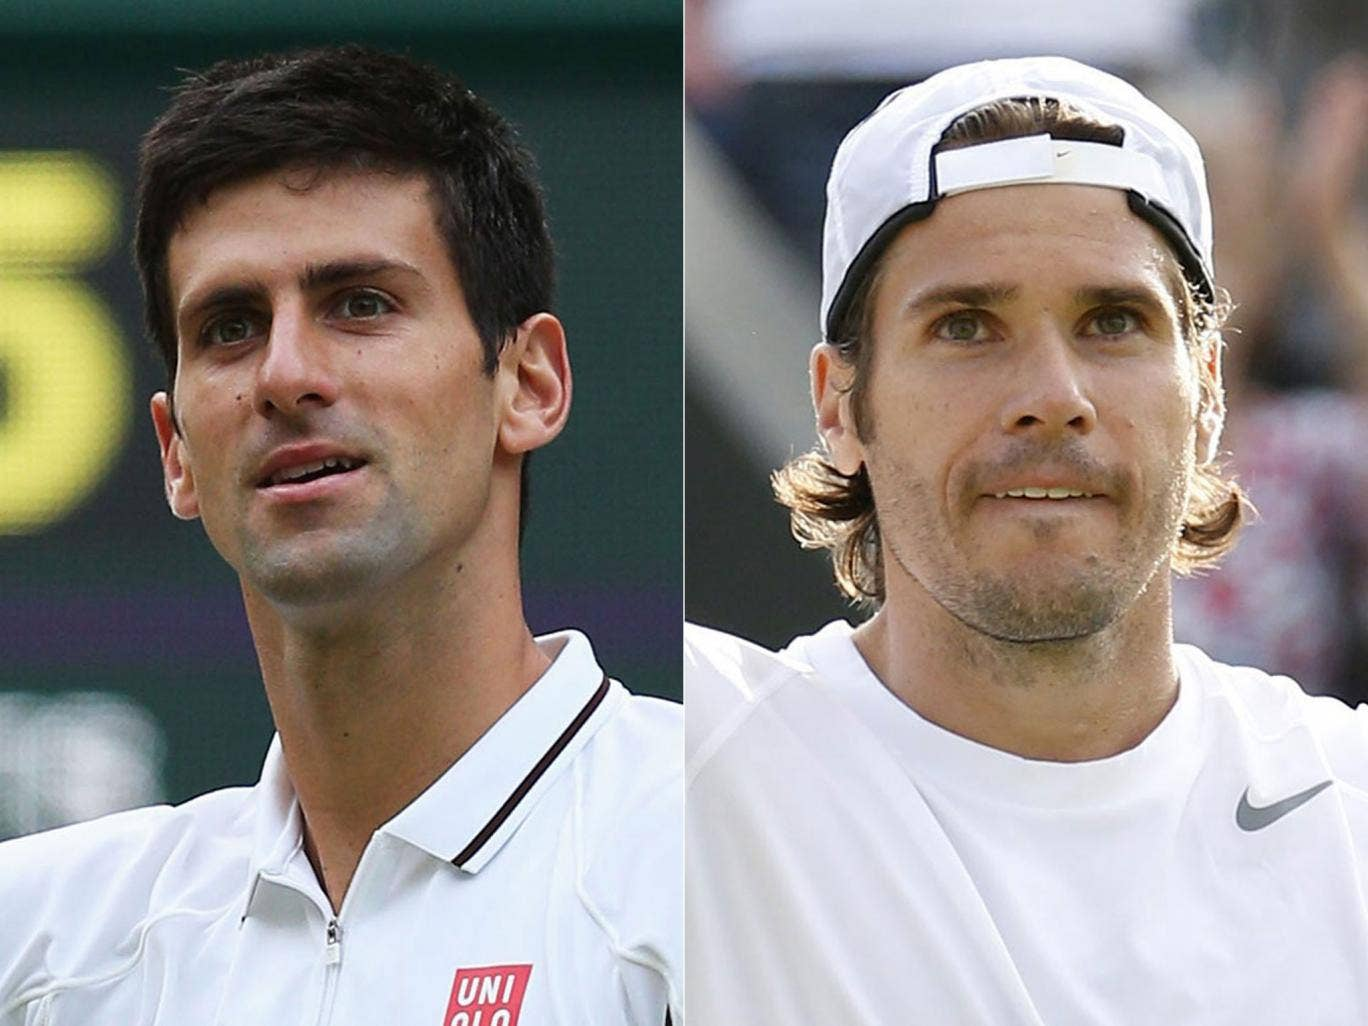 Djokovic v Haas